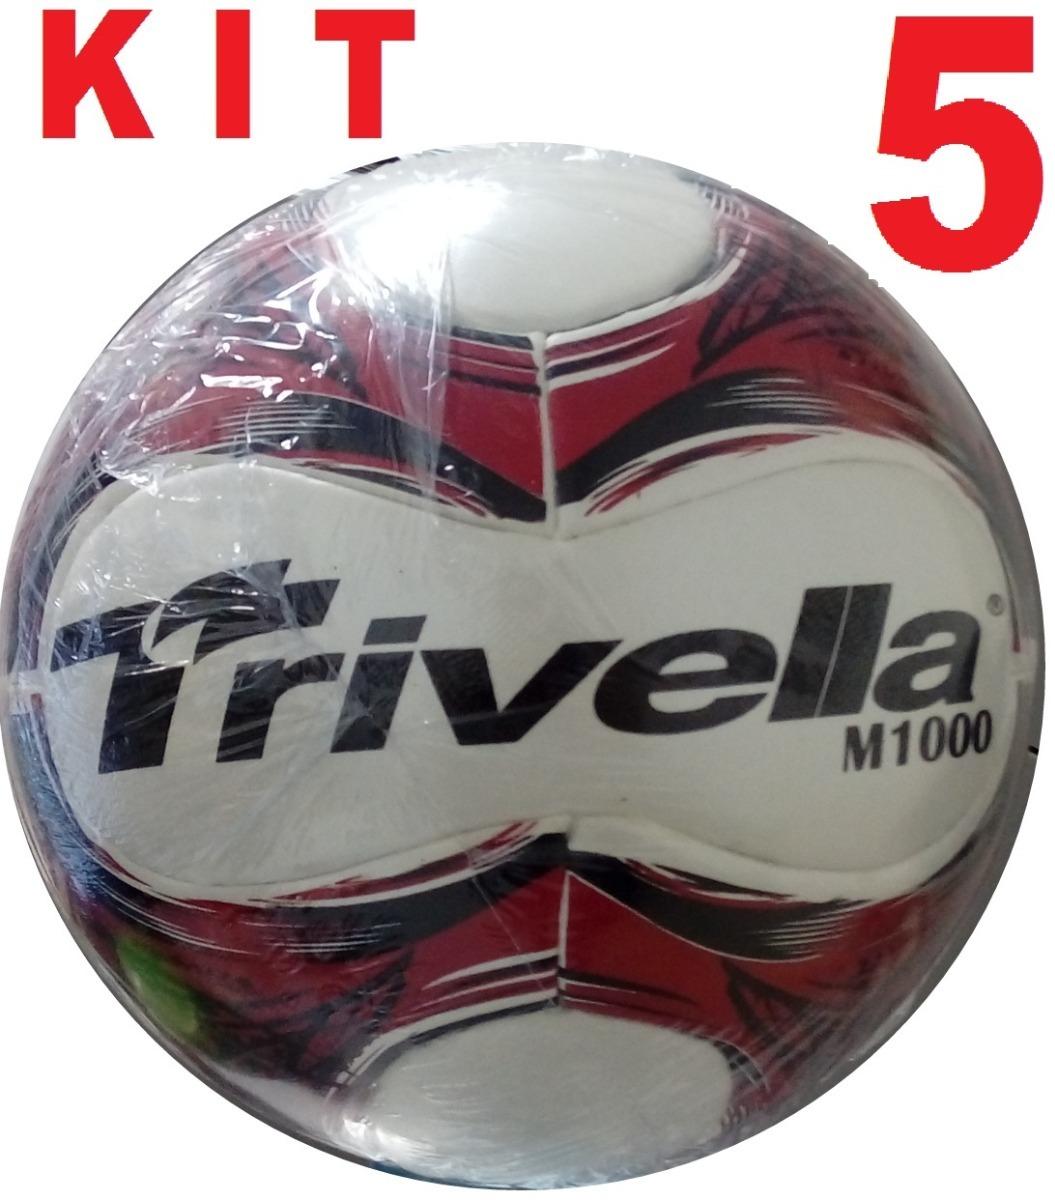 9659dbb5d1 kit 5 bolas de futebol futsal 100% pu trivella- brasil gold. Carregando zoom .